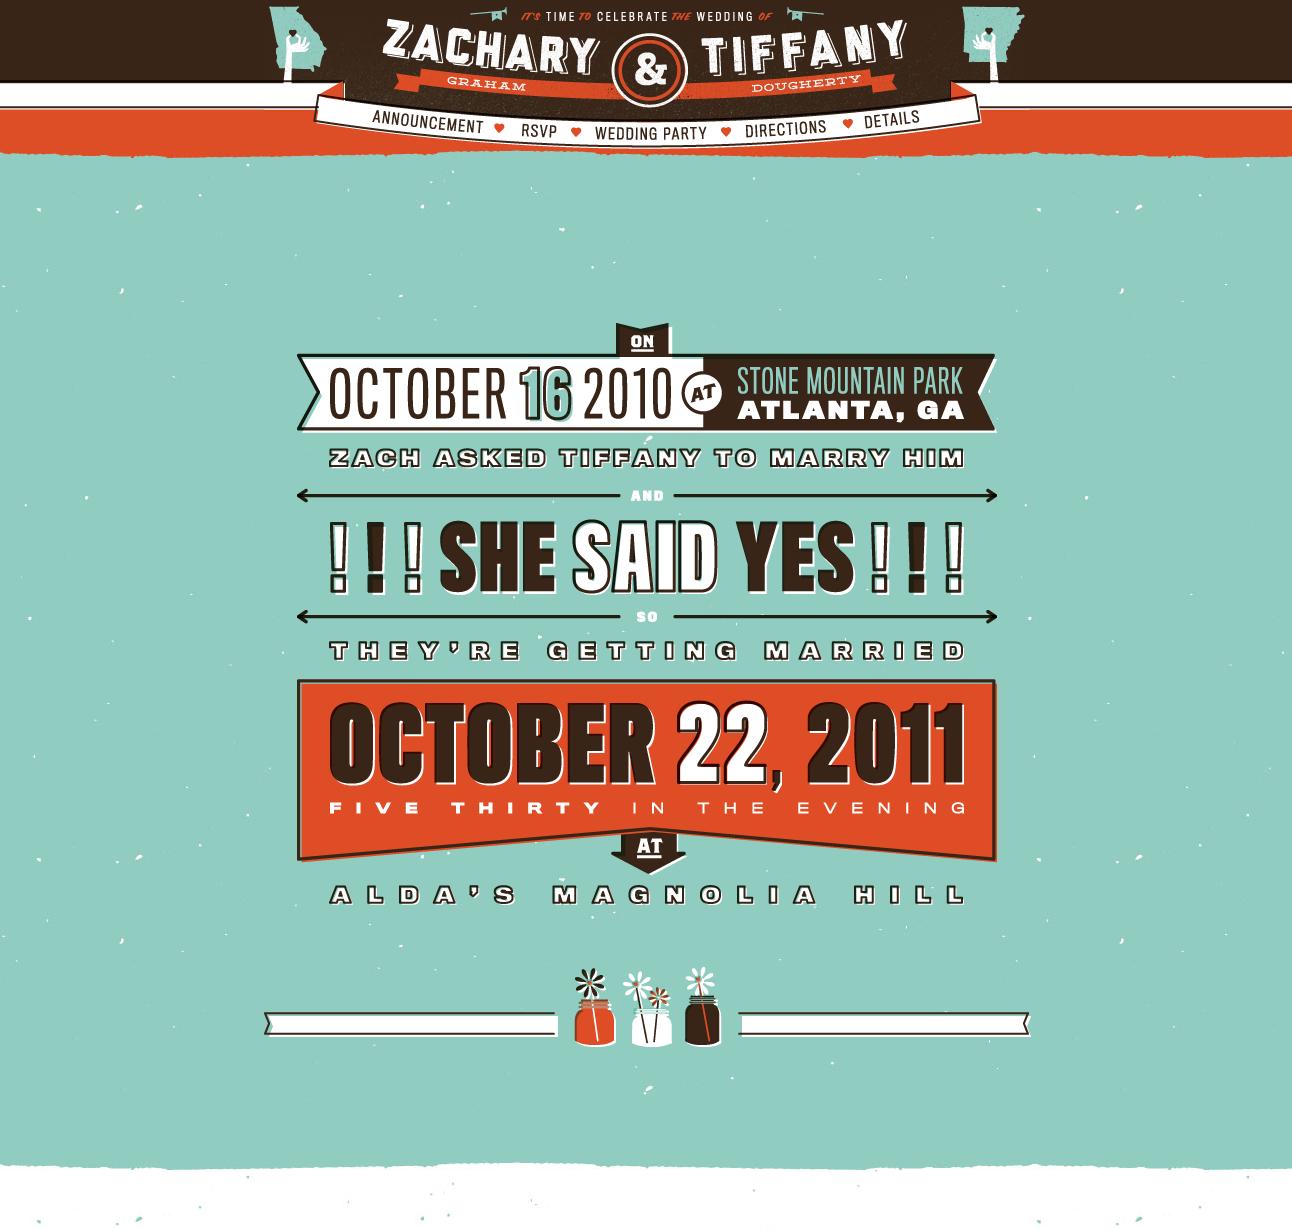 Zachary & Tiffany wedding website | Web Design | Pinterest | Wedding ...